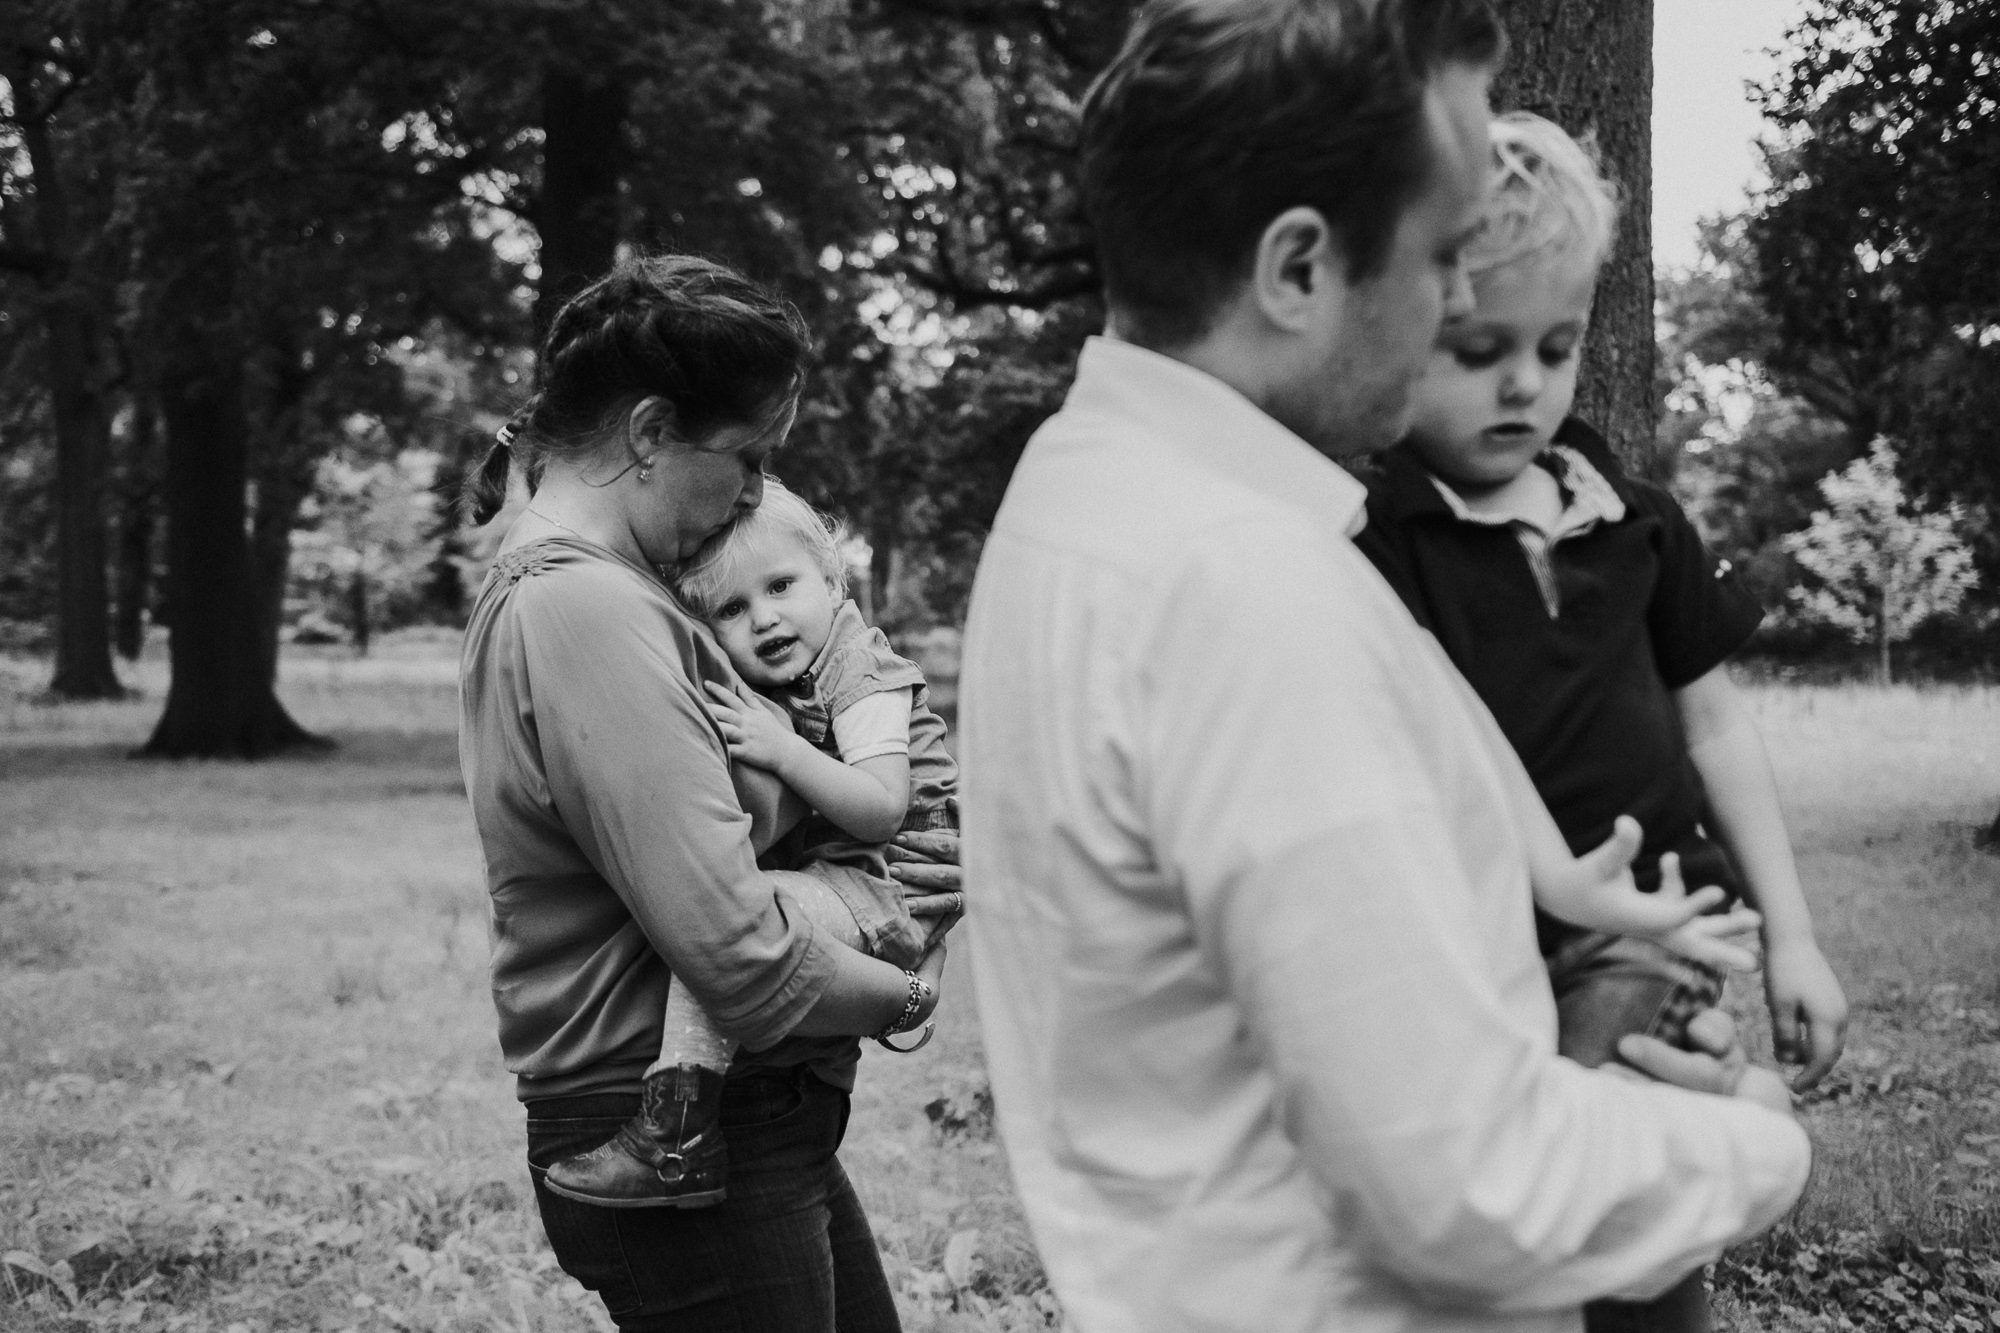 gezinsfotograaf fotoshoot Den Bosch